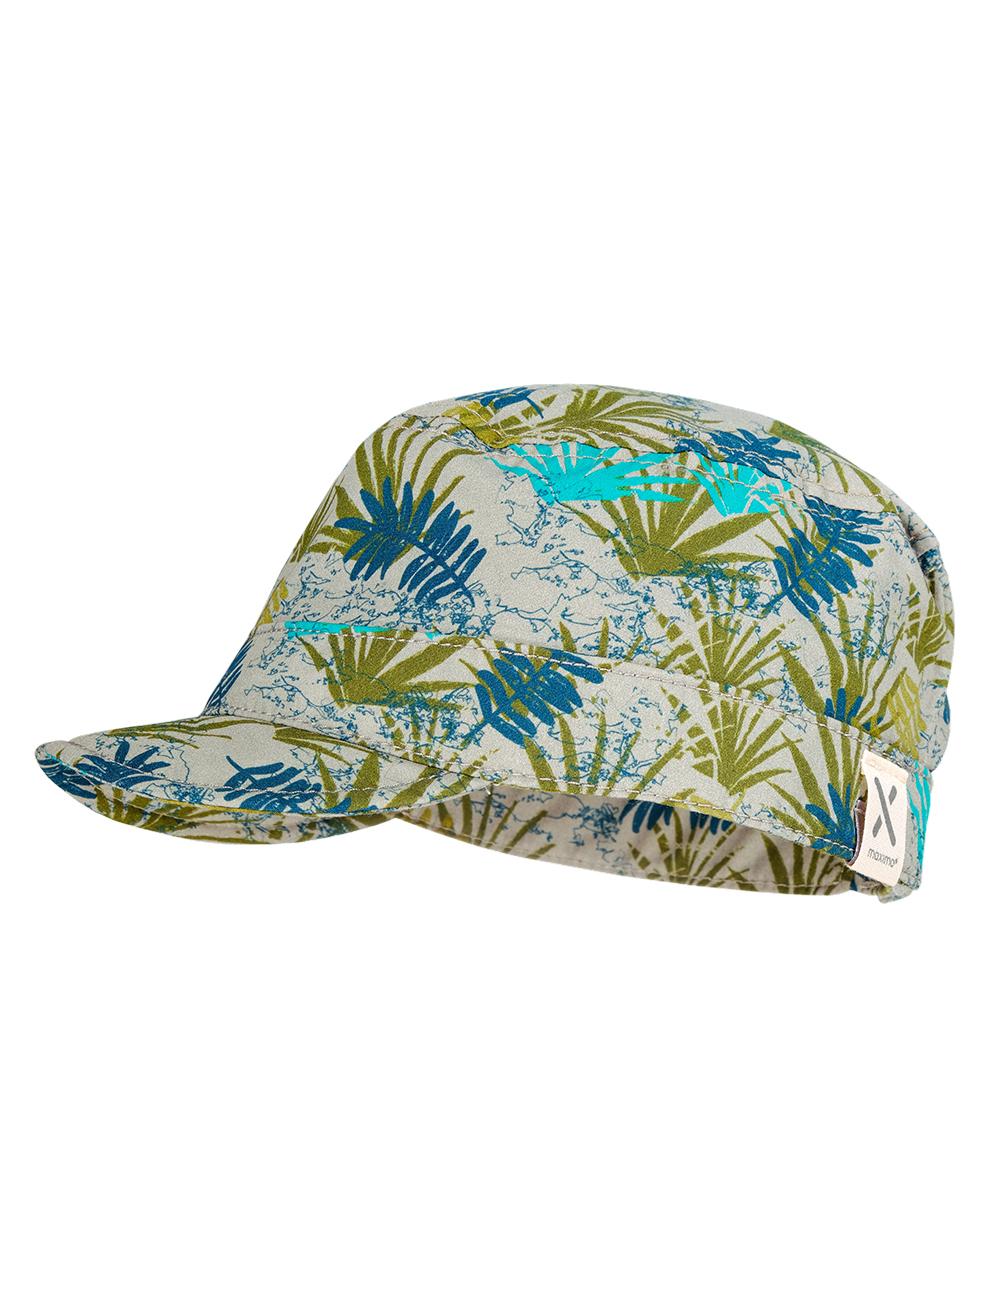 BOY-Cap 53 Maximo. Farbe: sand-grün-palmenblätter, Größe: 53